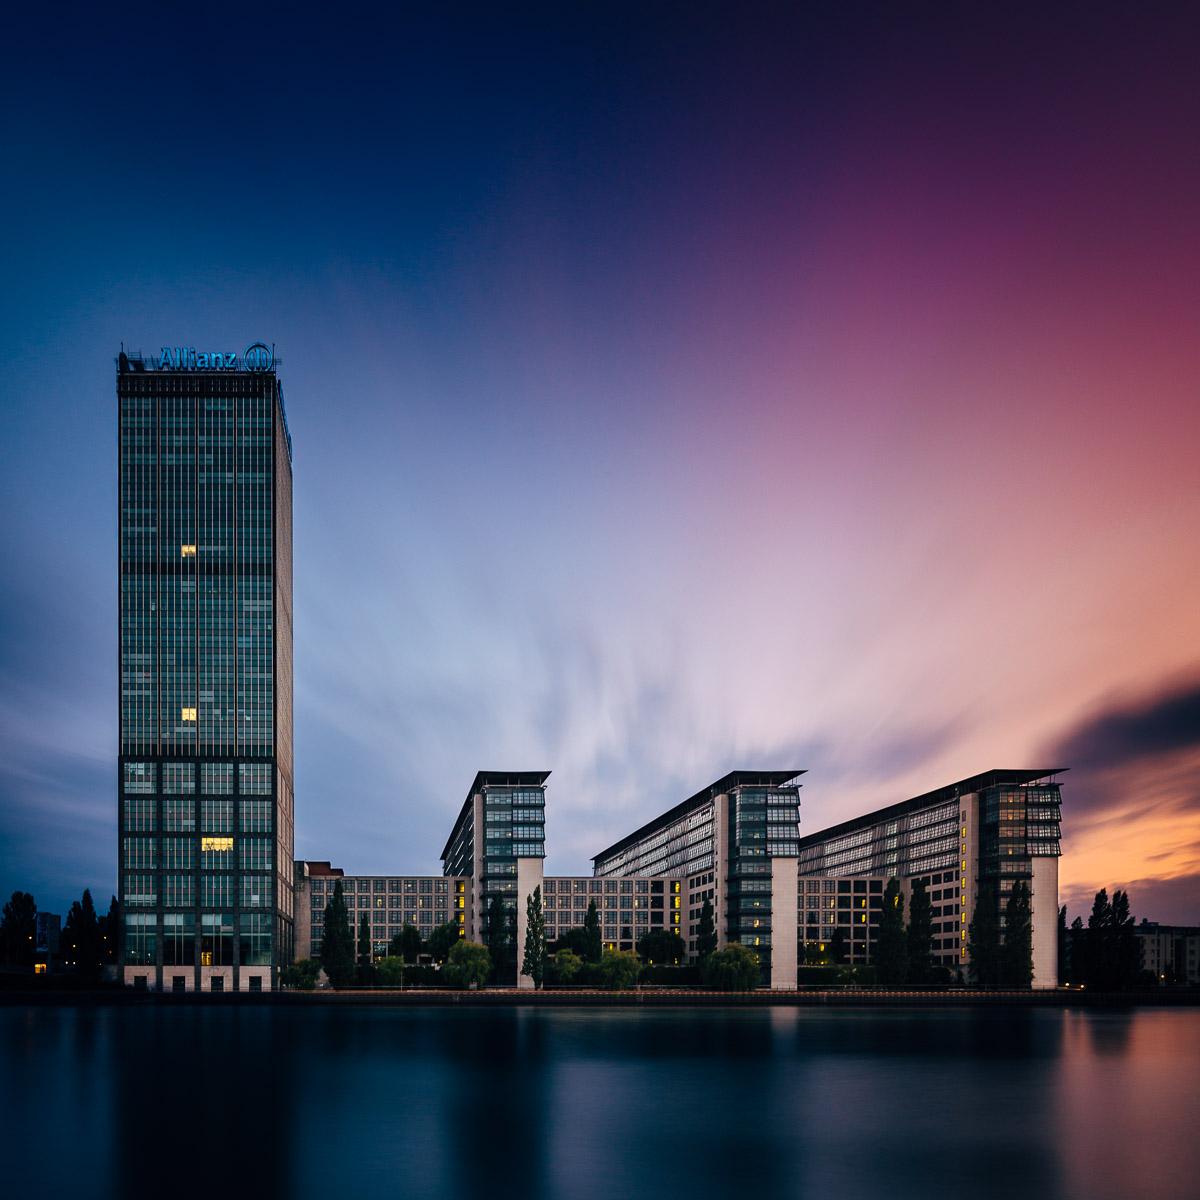 Treptowers in Berlin